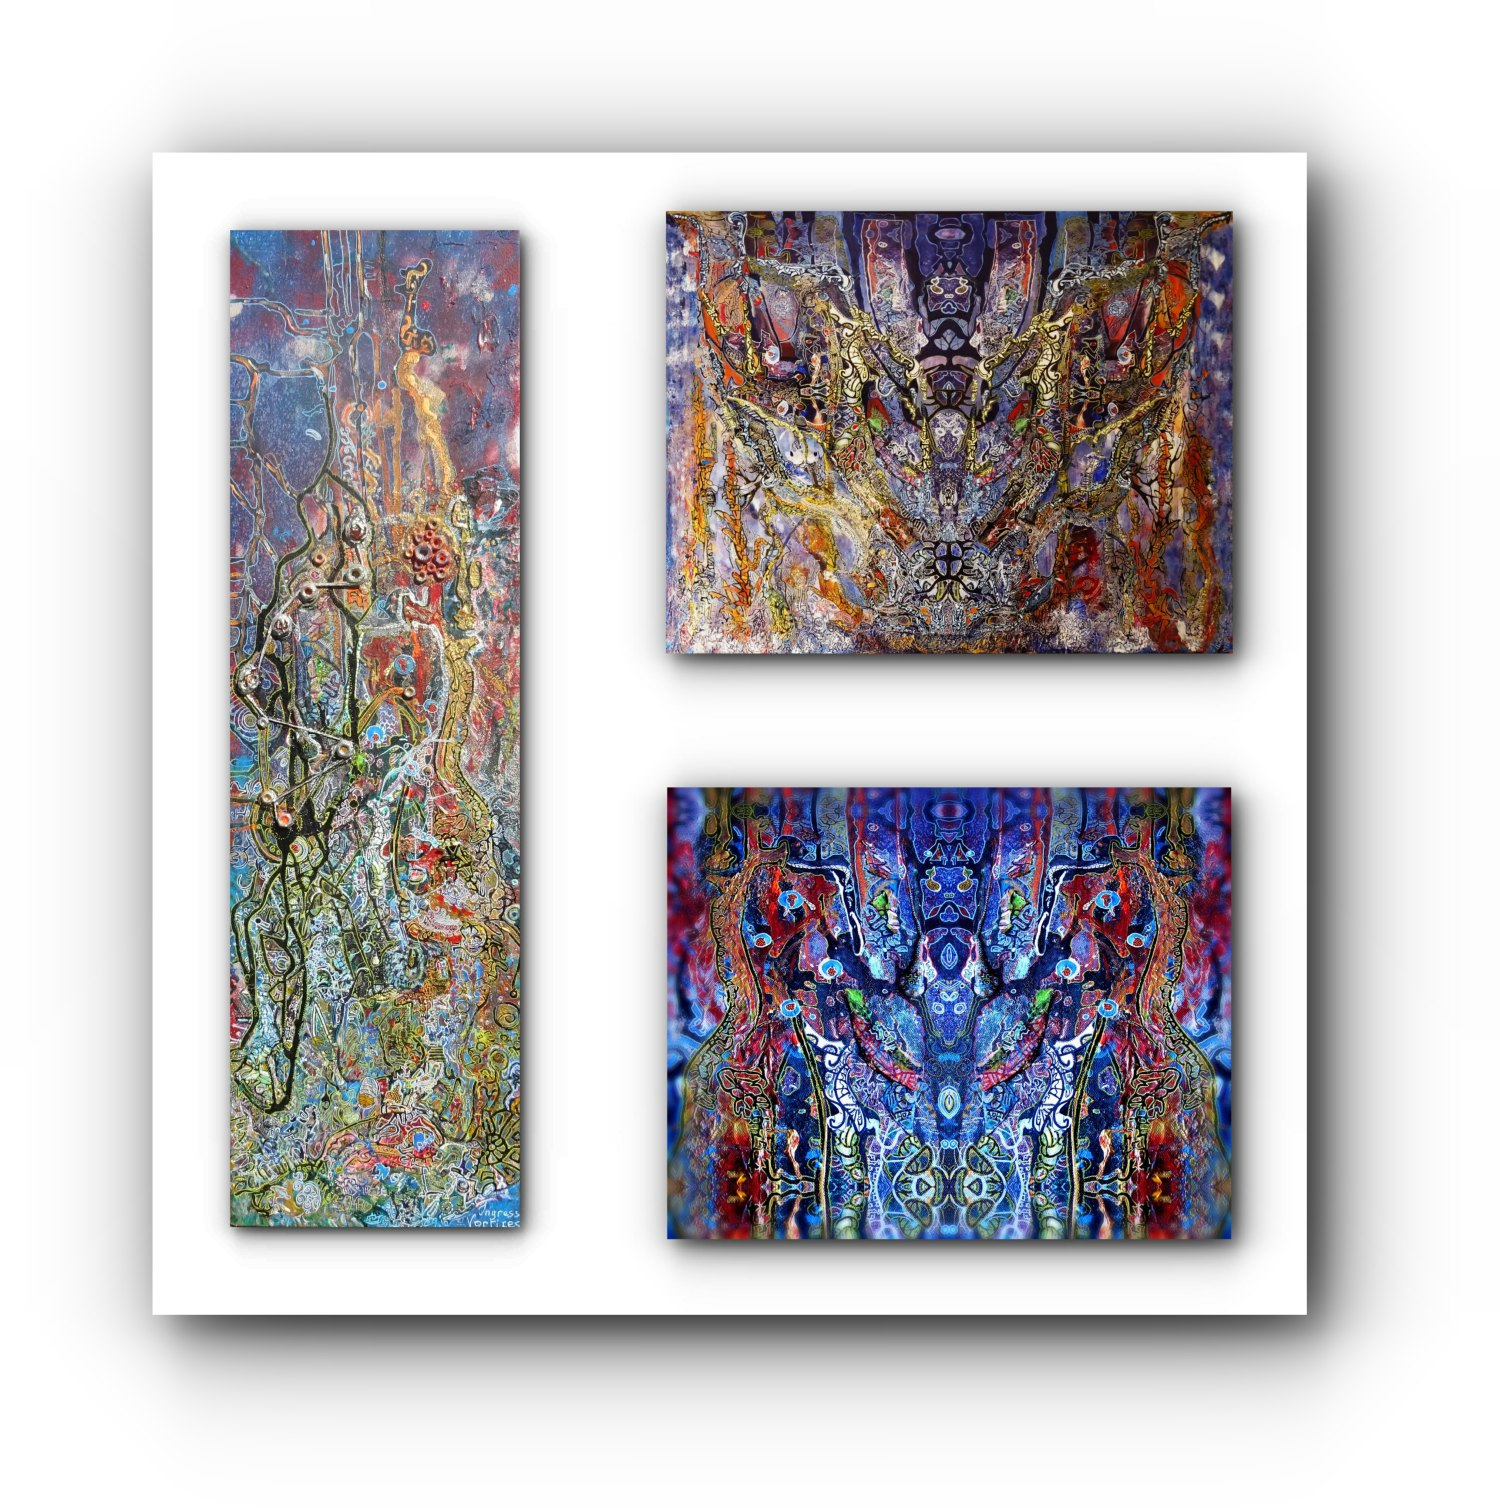 painting-levare-levis-innnerspace-organism-artists-ingress-vortices.jpg